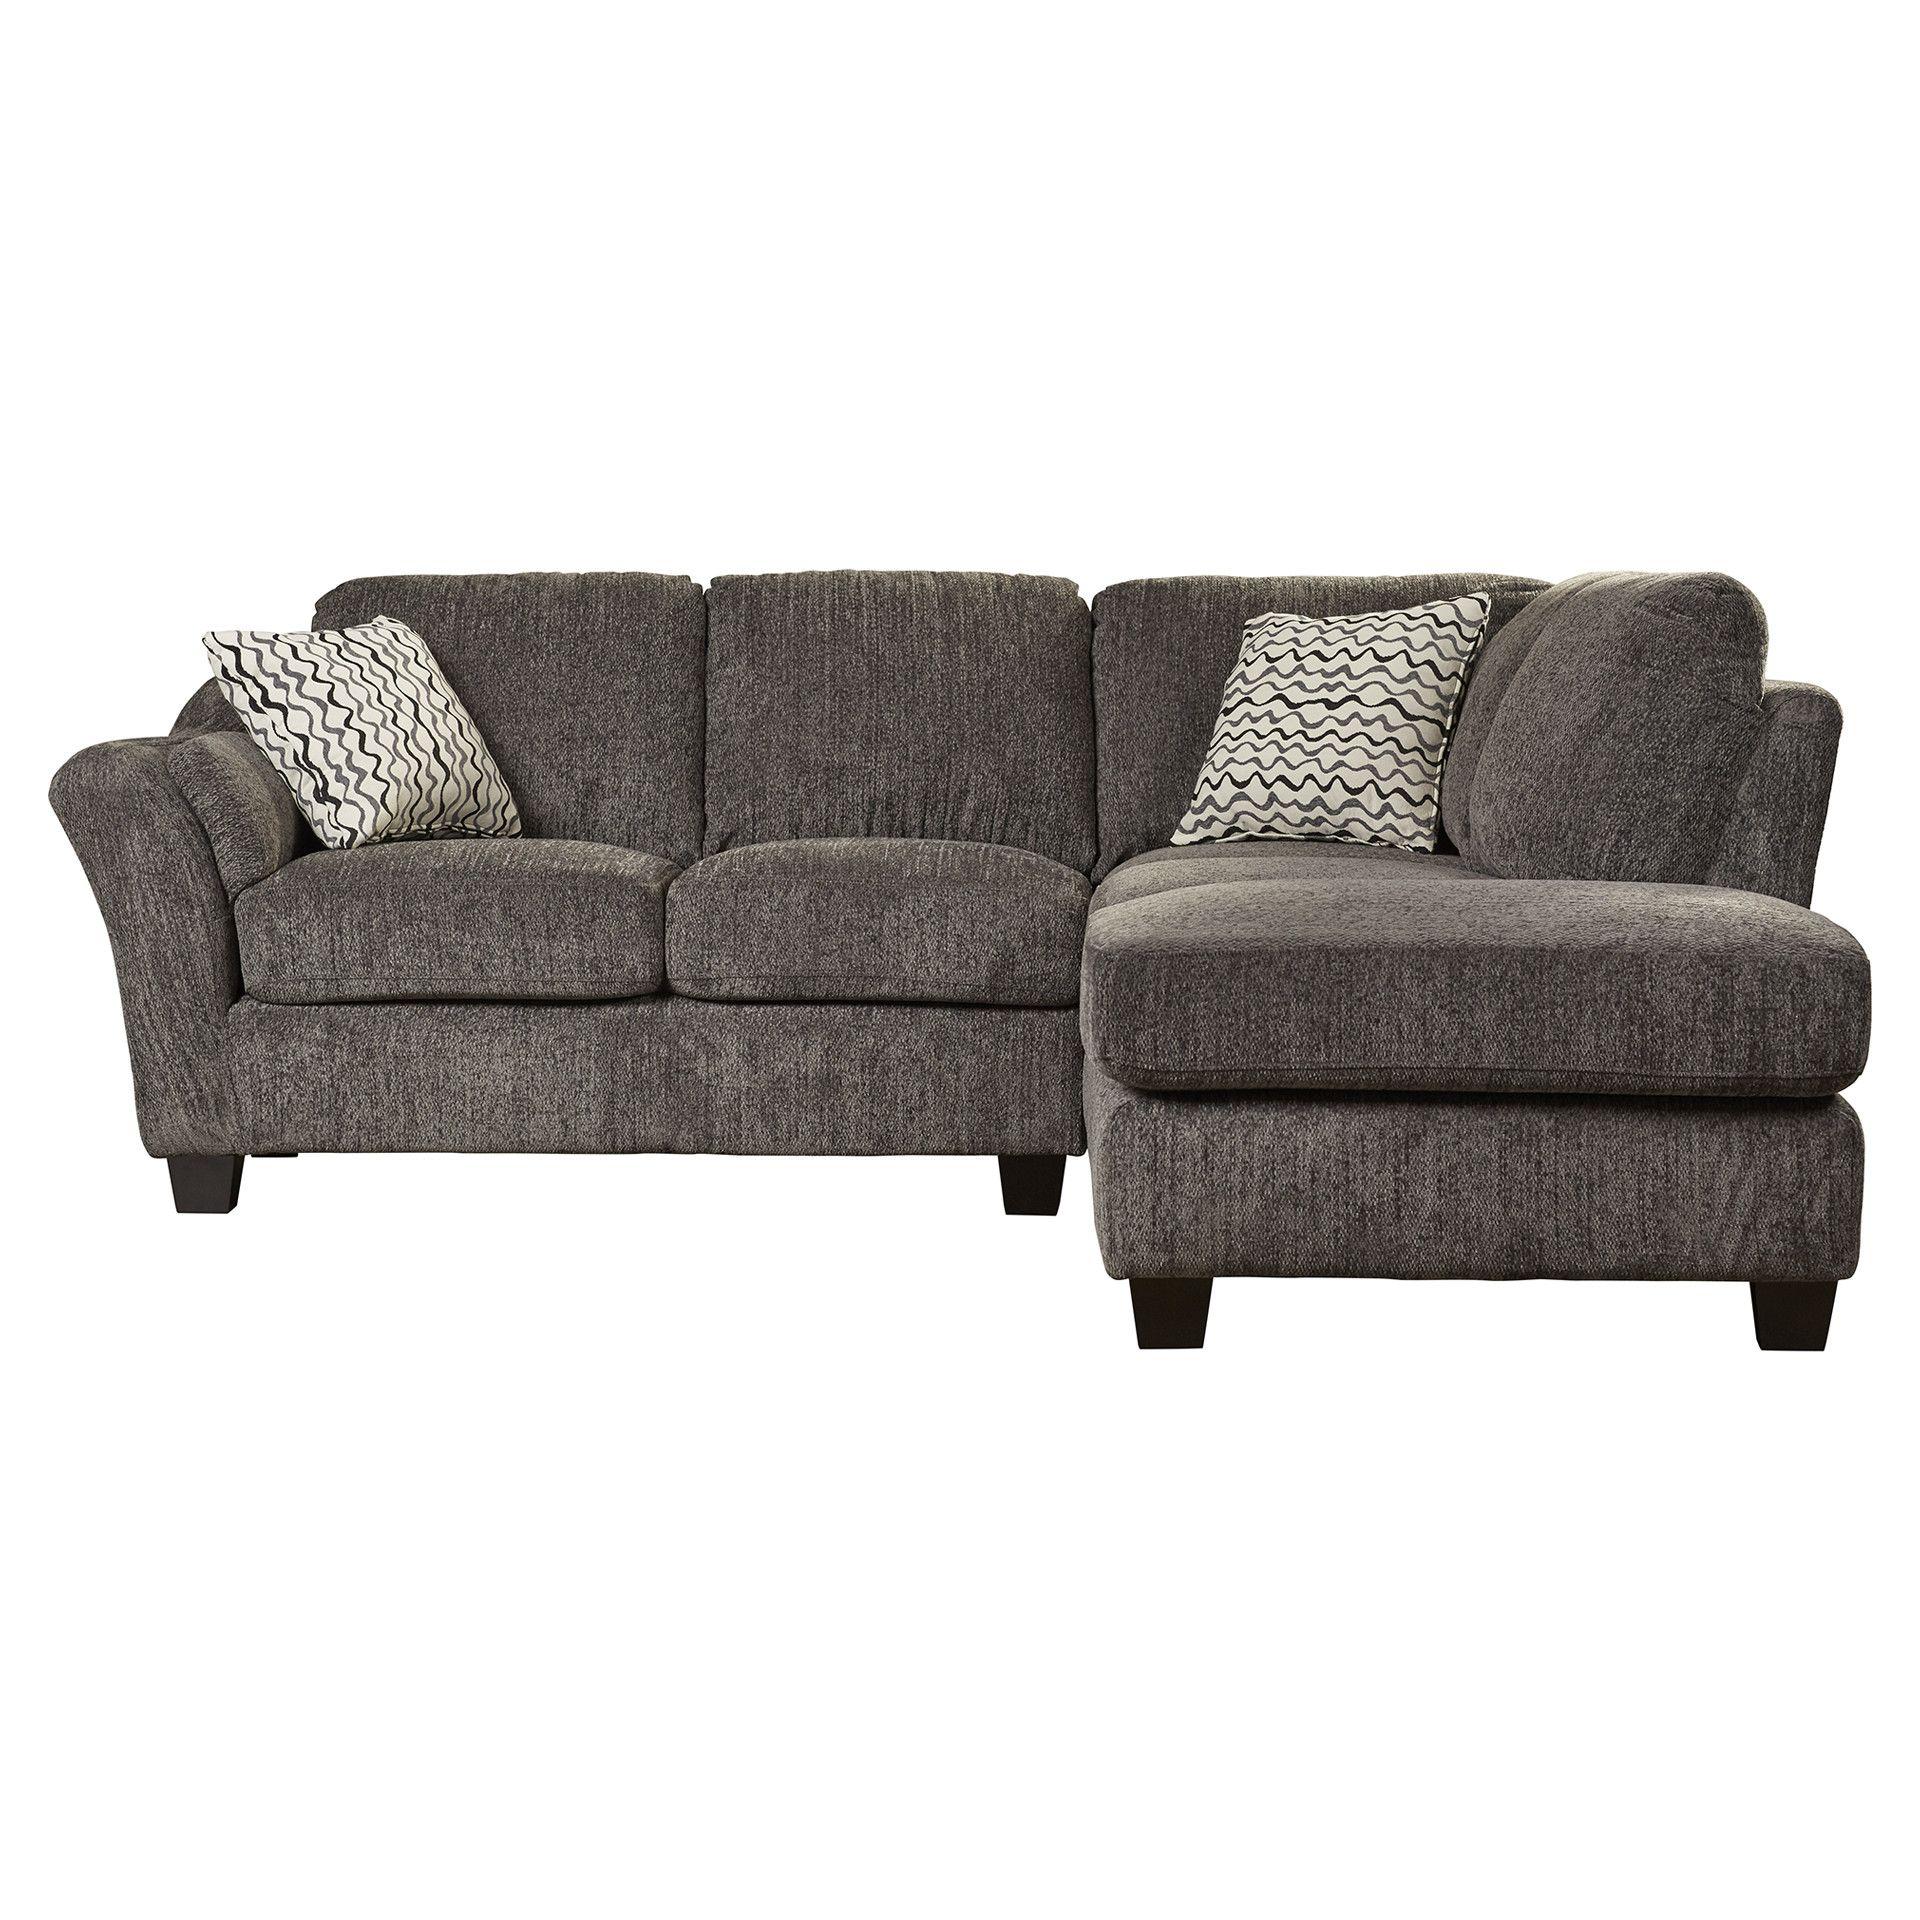 Three seat high back large Ekornes Stressless reclining sofa in